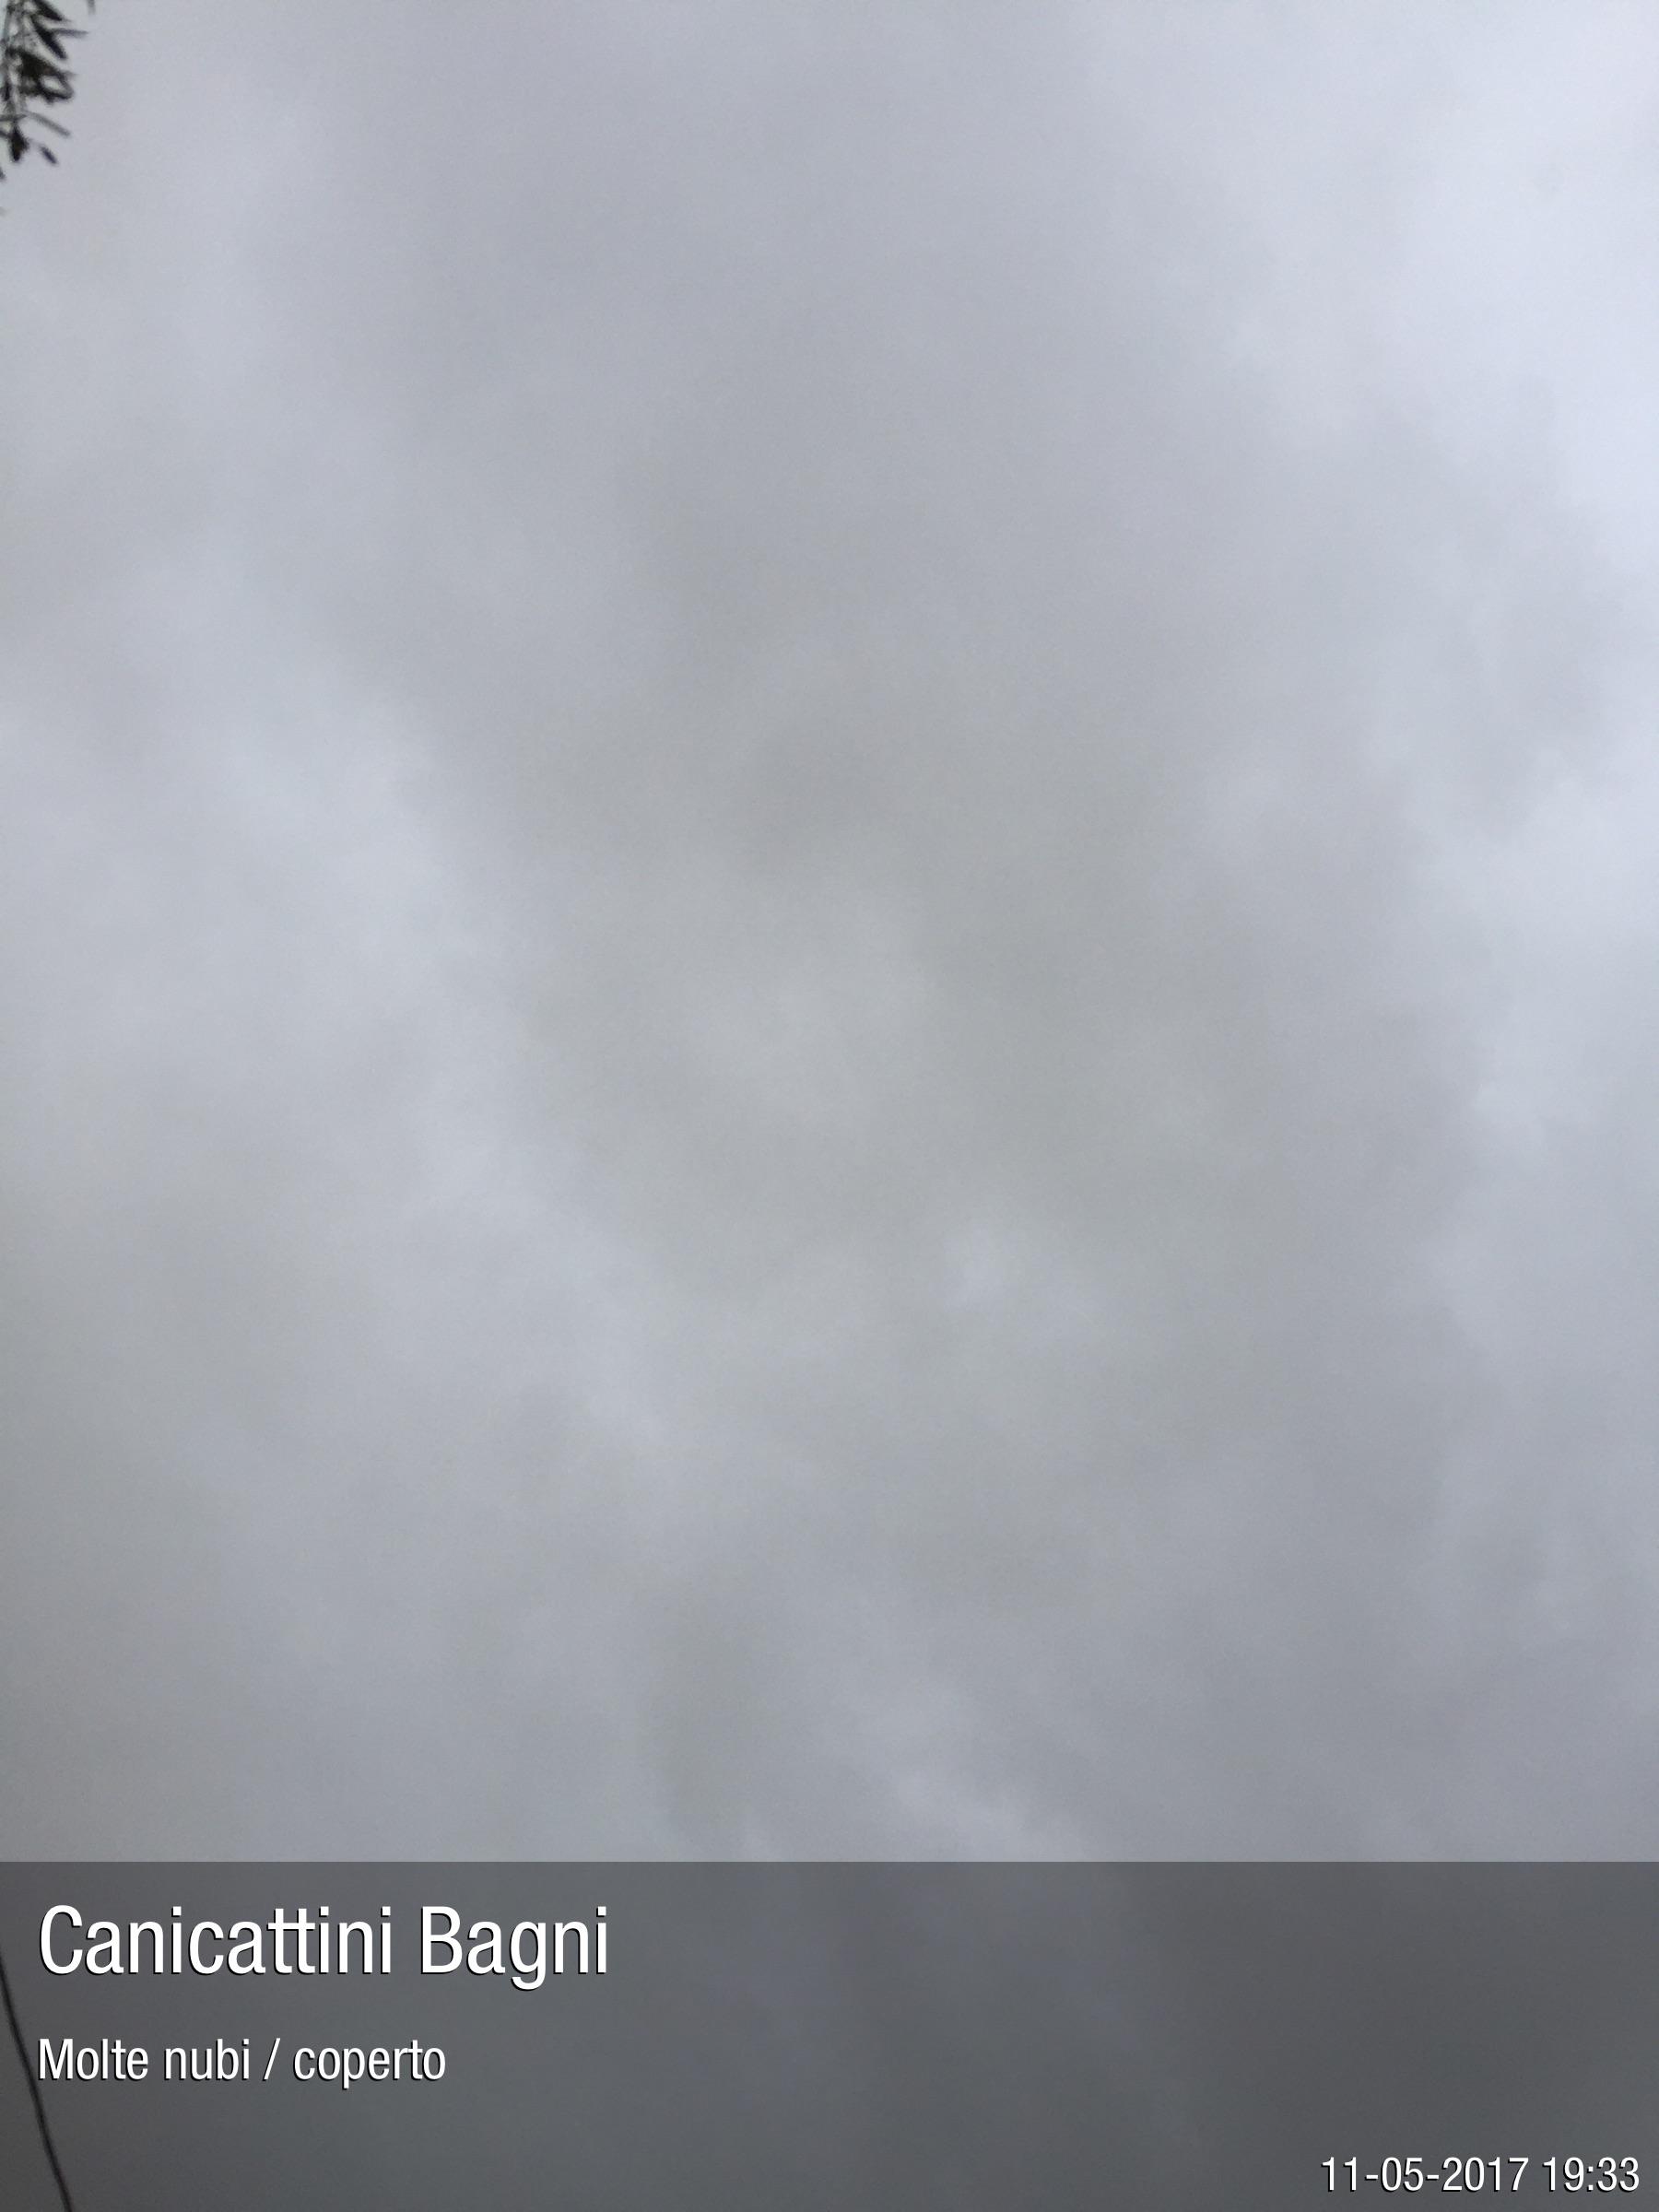 Foto meteo - Canicattini Bagni - Canicattini Bagni ore 19:33 ...